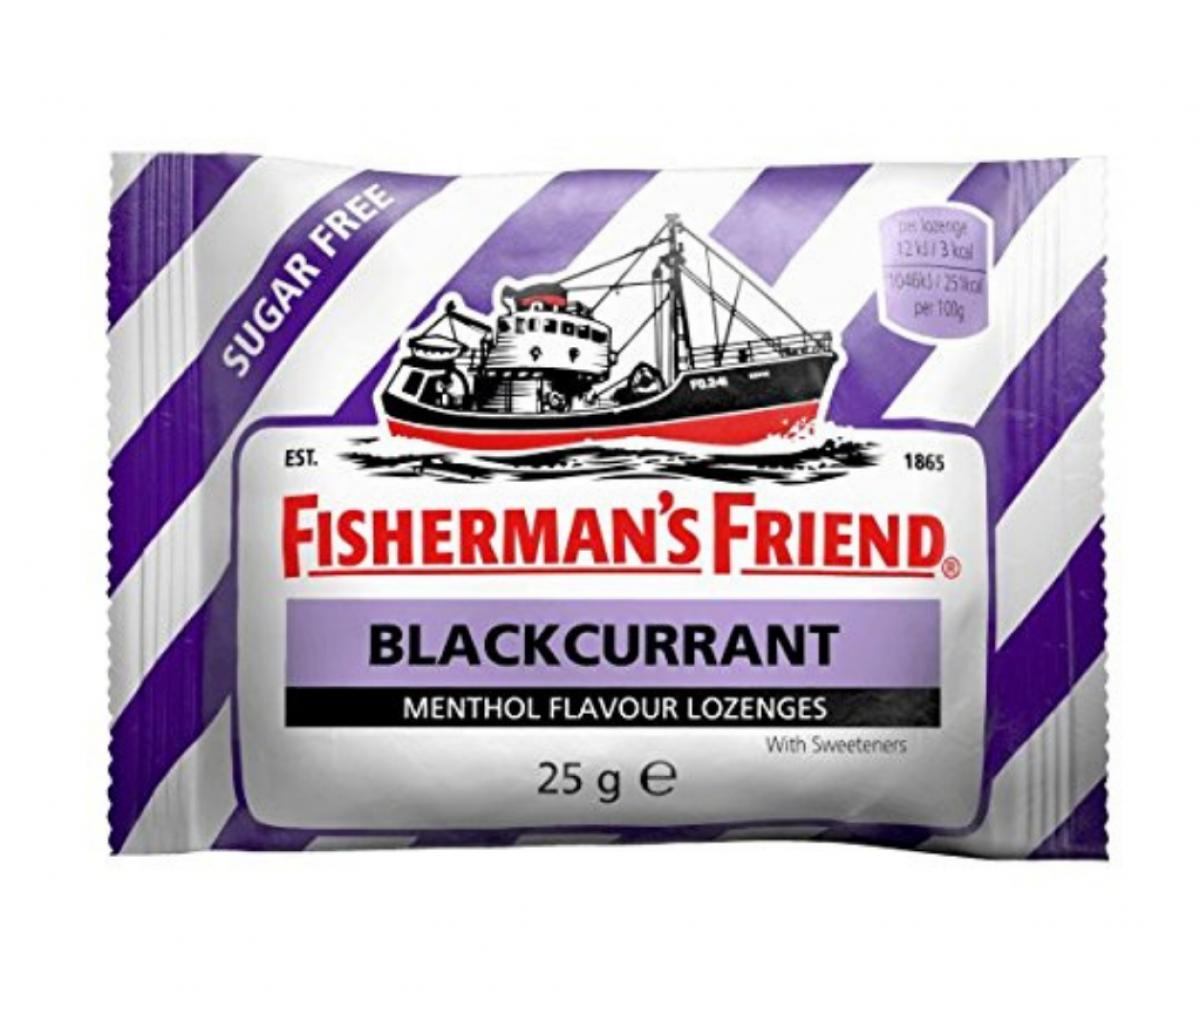 Fisherman's Friend Sugar free Blackcurrant 25g